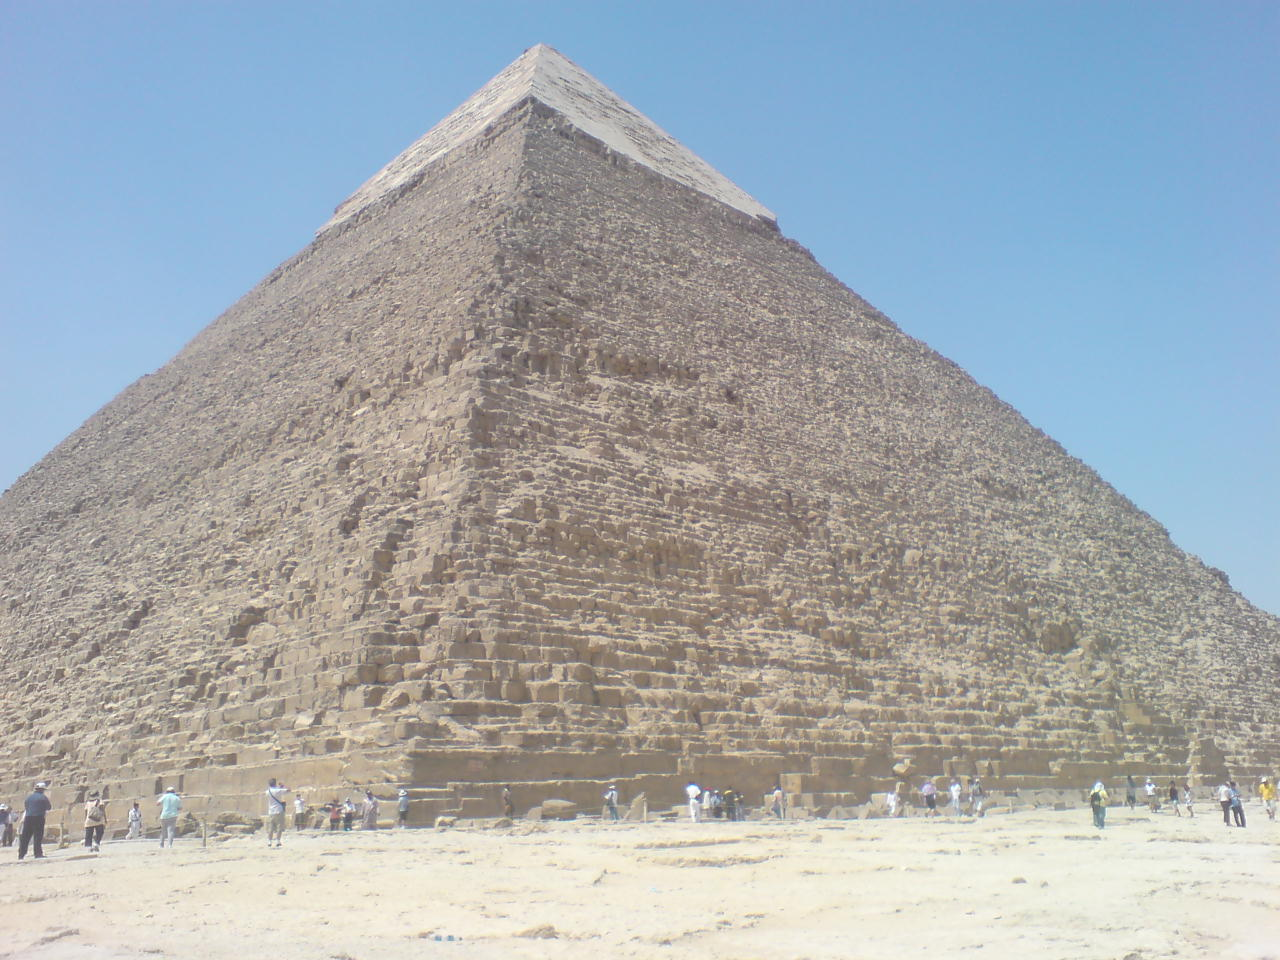 File:Pyramids 2 977.PNG - Wikipedia, the free encyclopedia